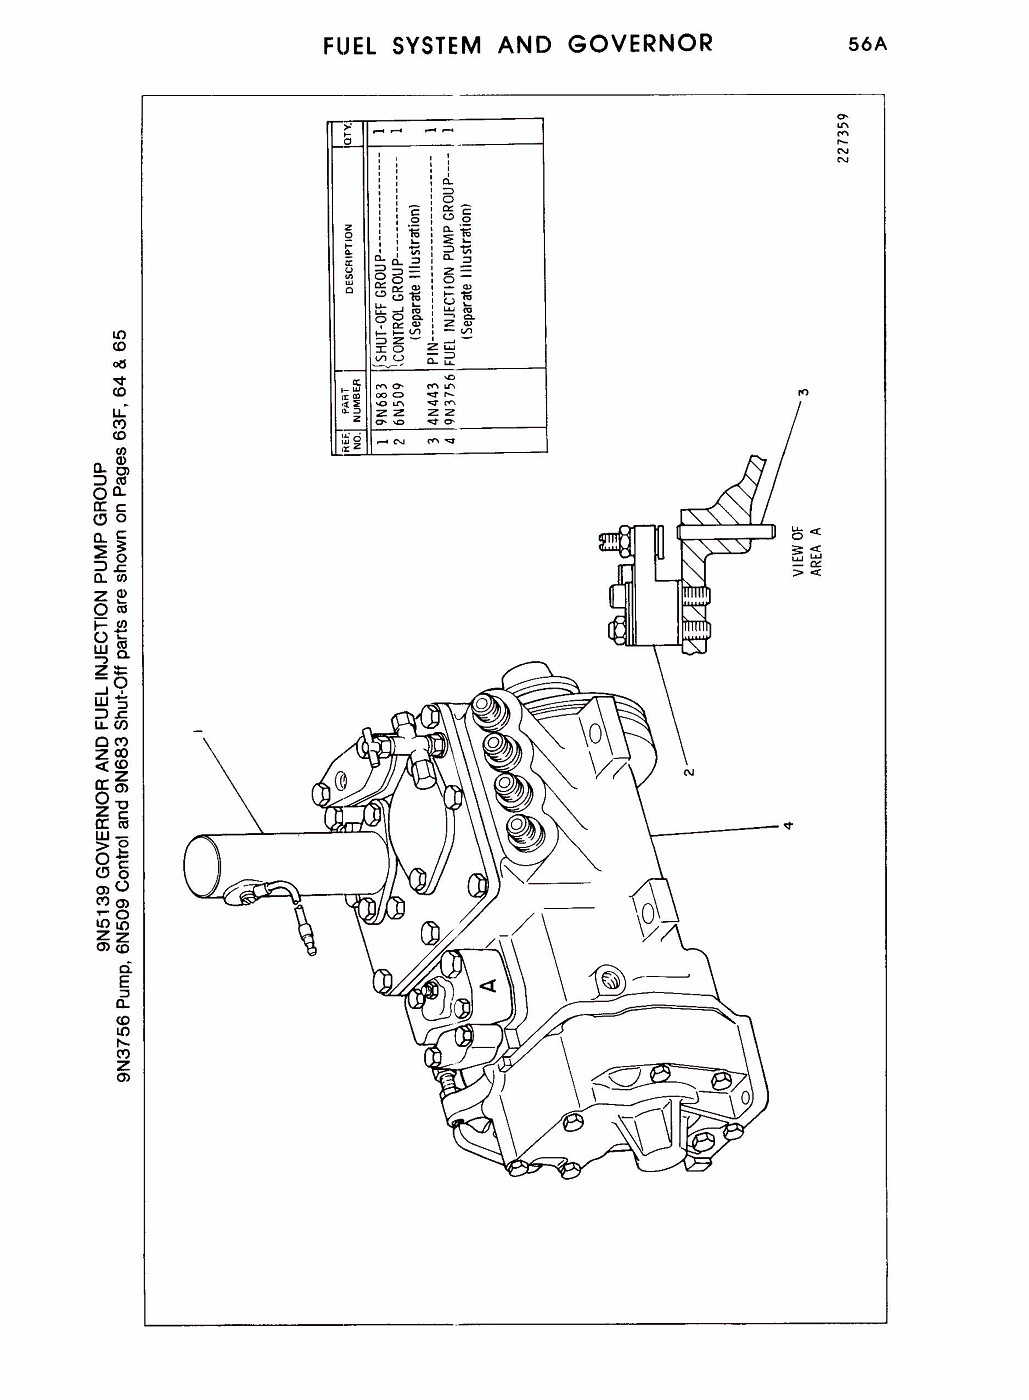 Cat Injection Pump Diagram